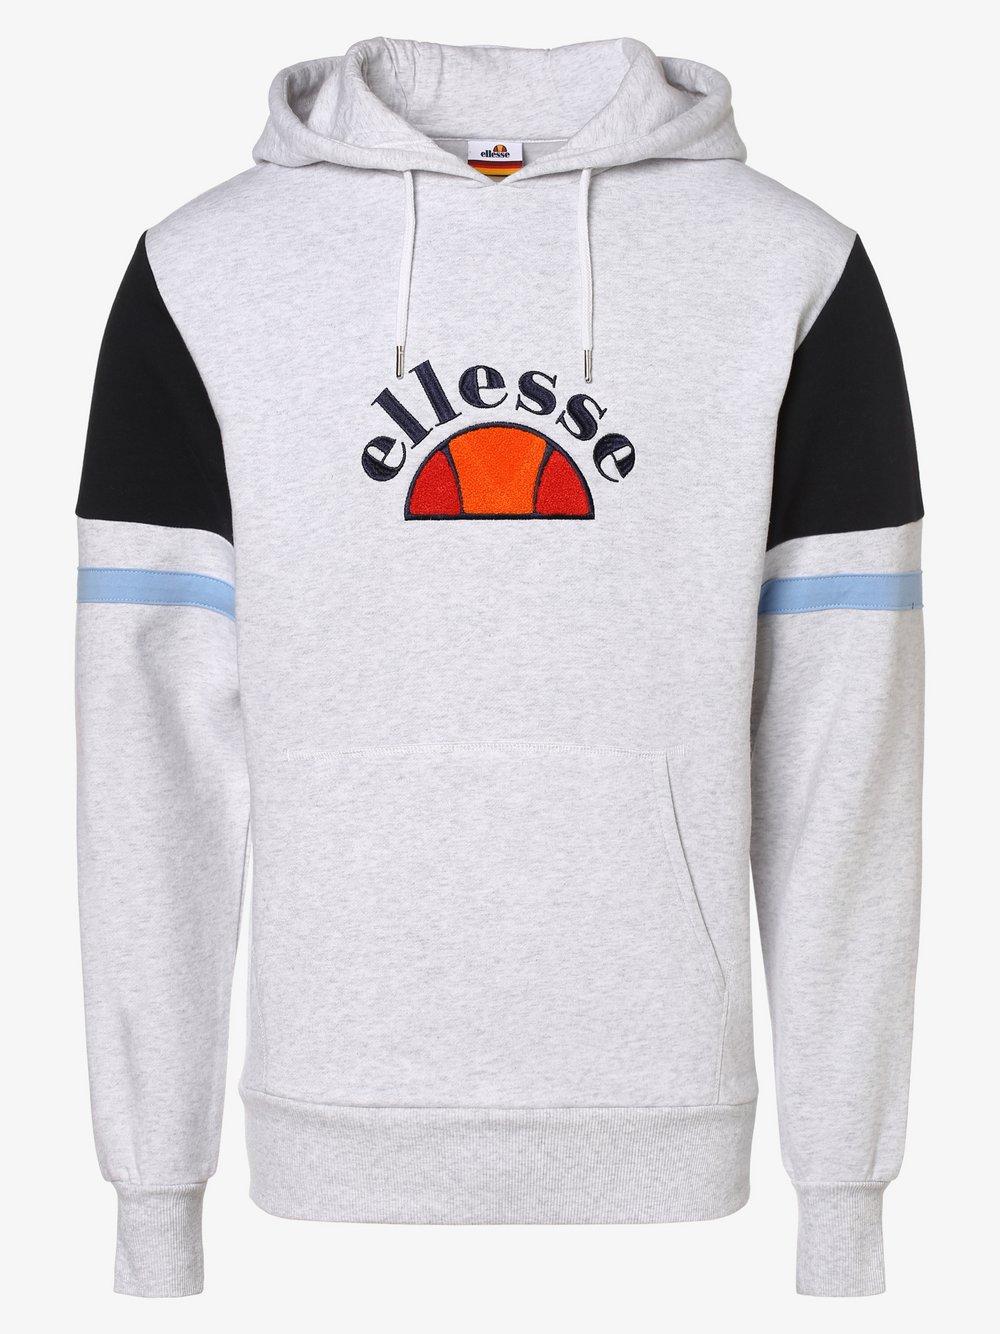 ellesse - Męska bluza nierozpinana – Petto, szary